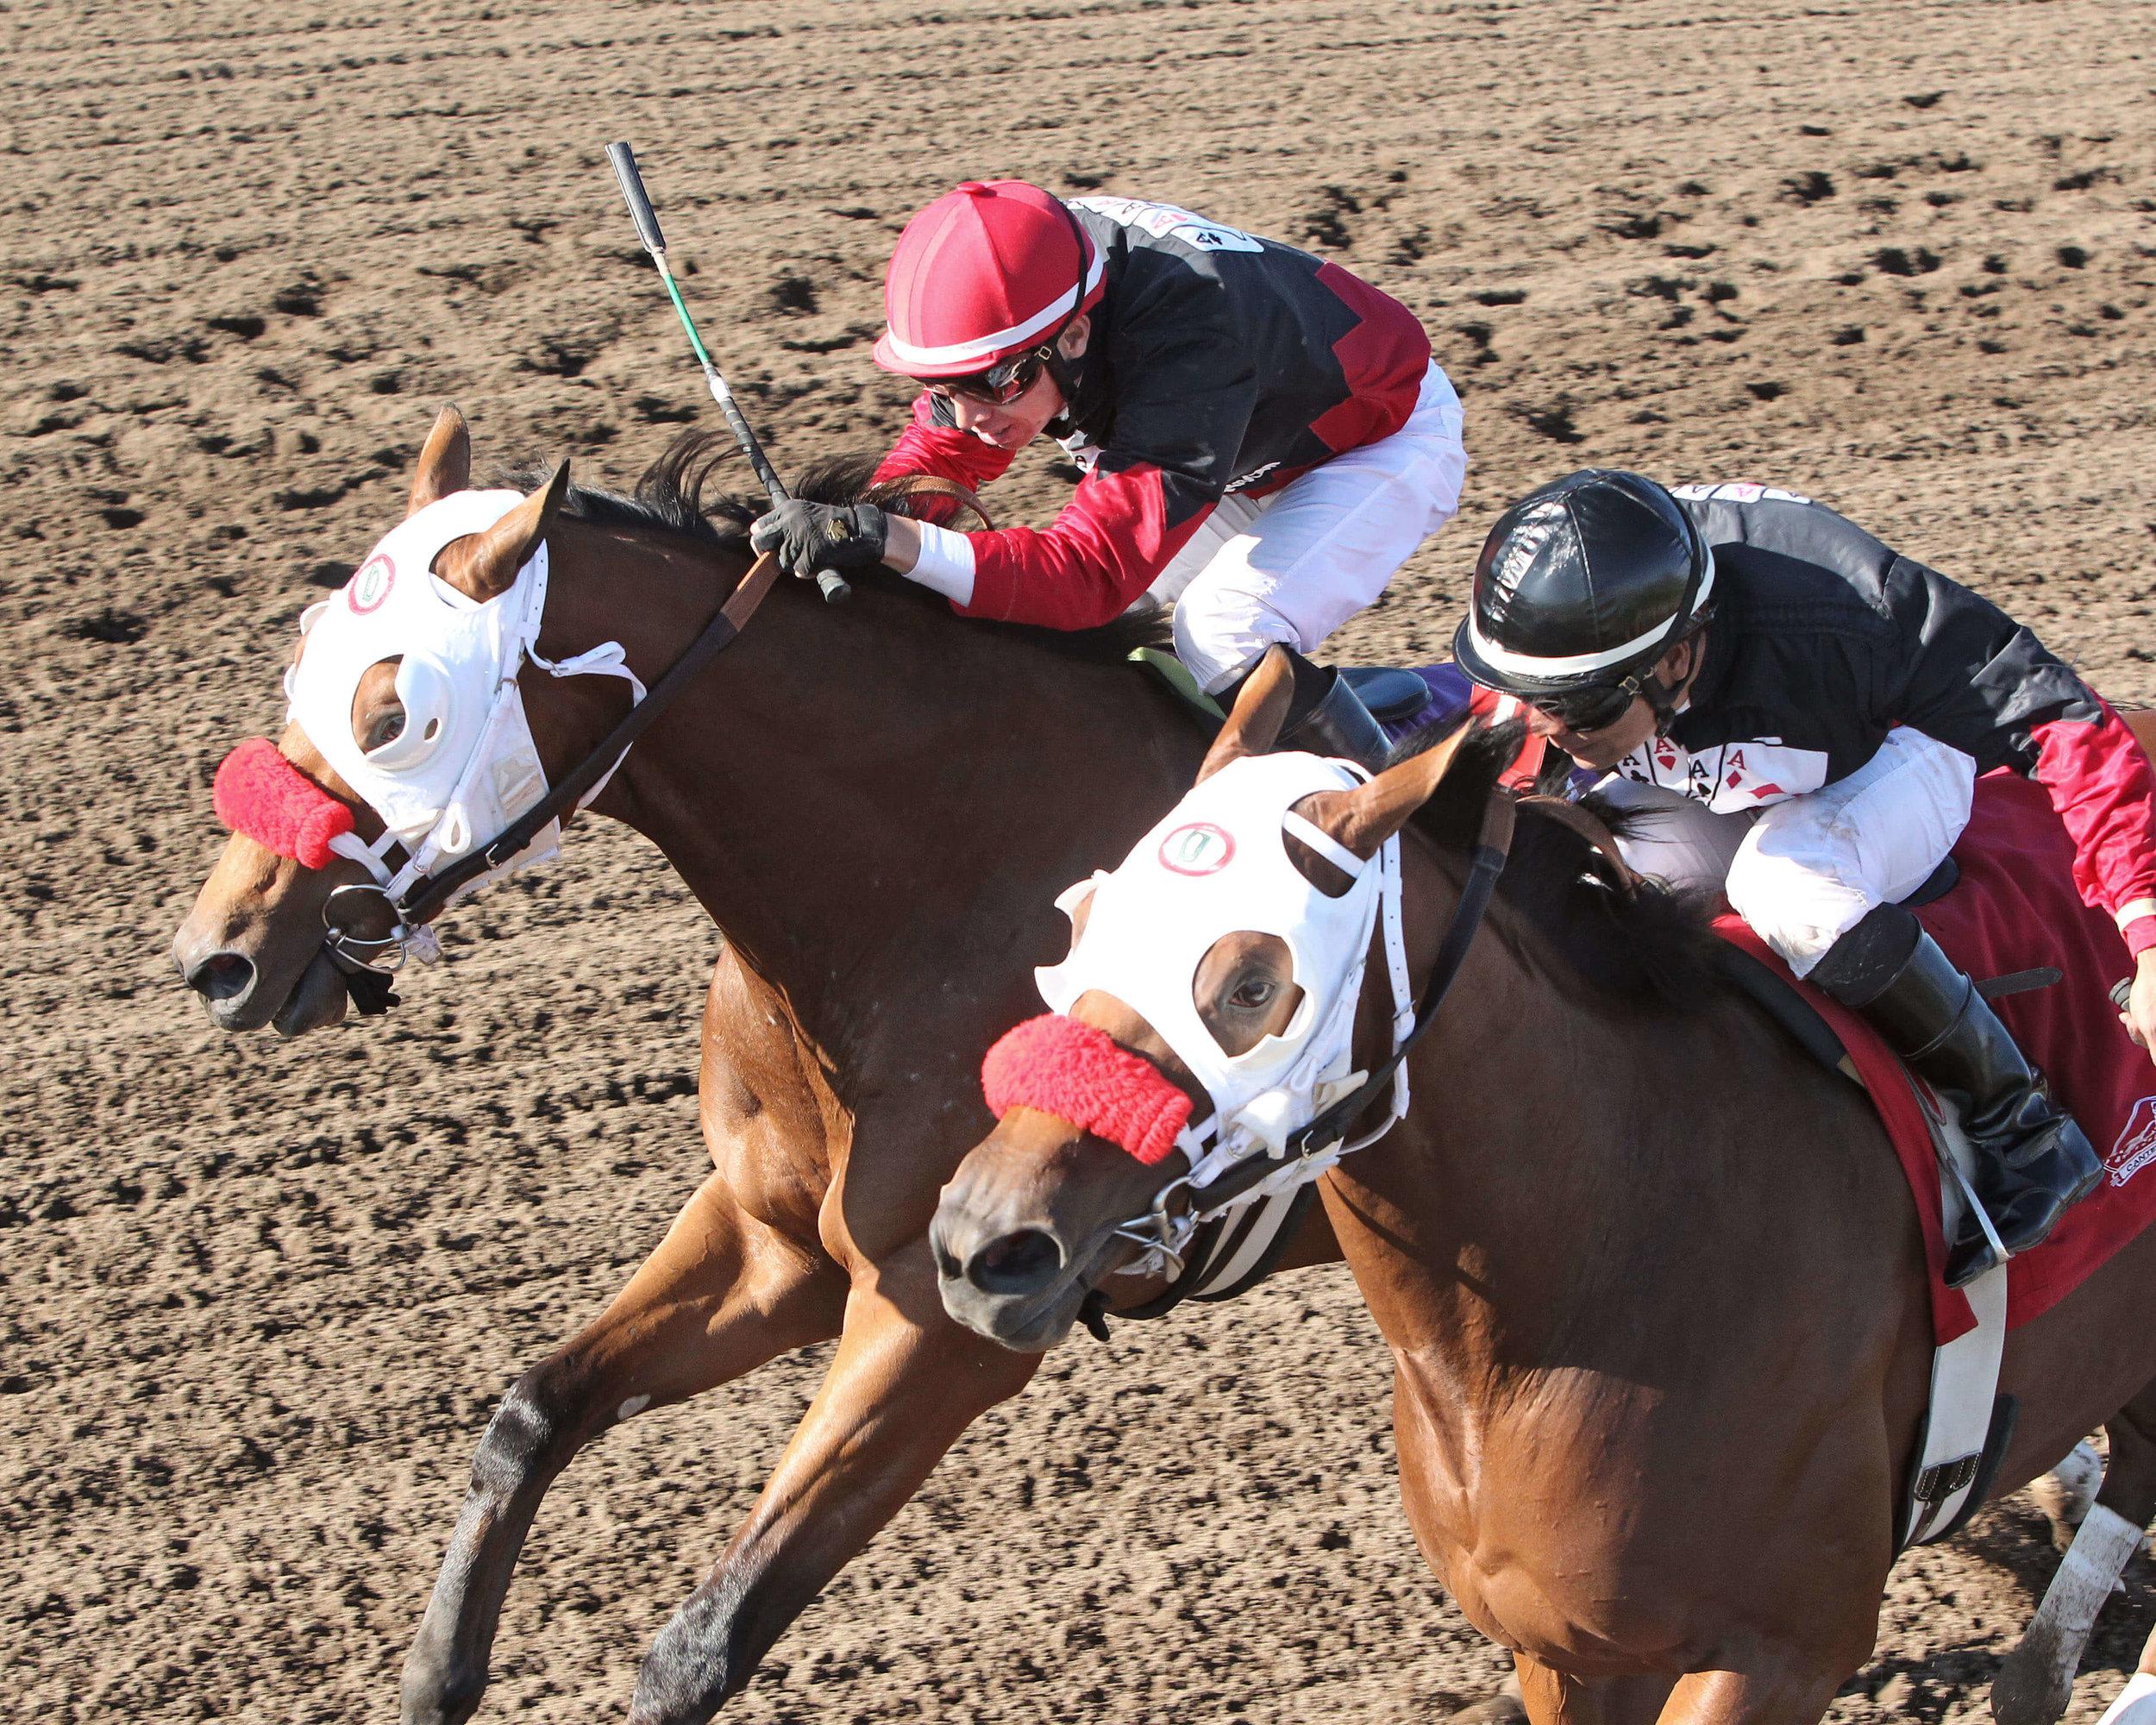 Native American & Grand Full Moon (DH) - Shakopee Juvenile Stakes - 09-13-14 - R09 - CBY - Inside Finish (1).jpg